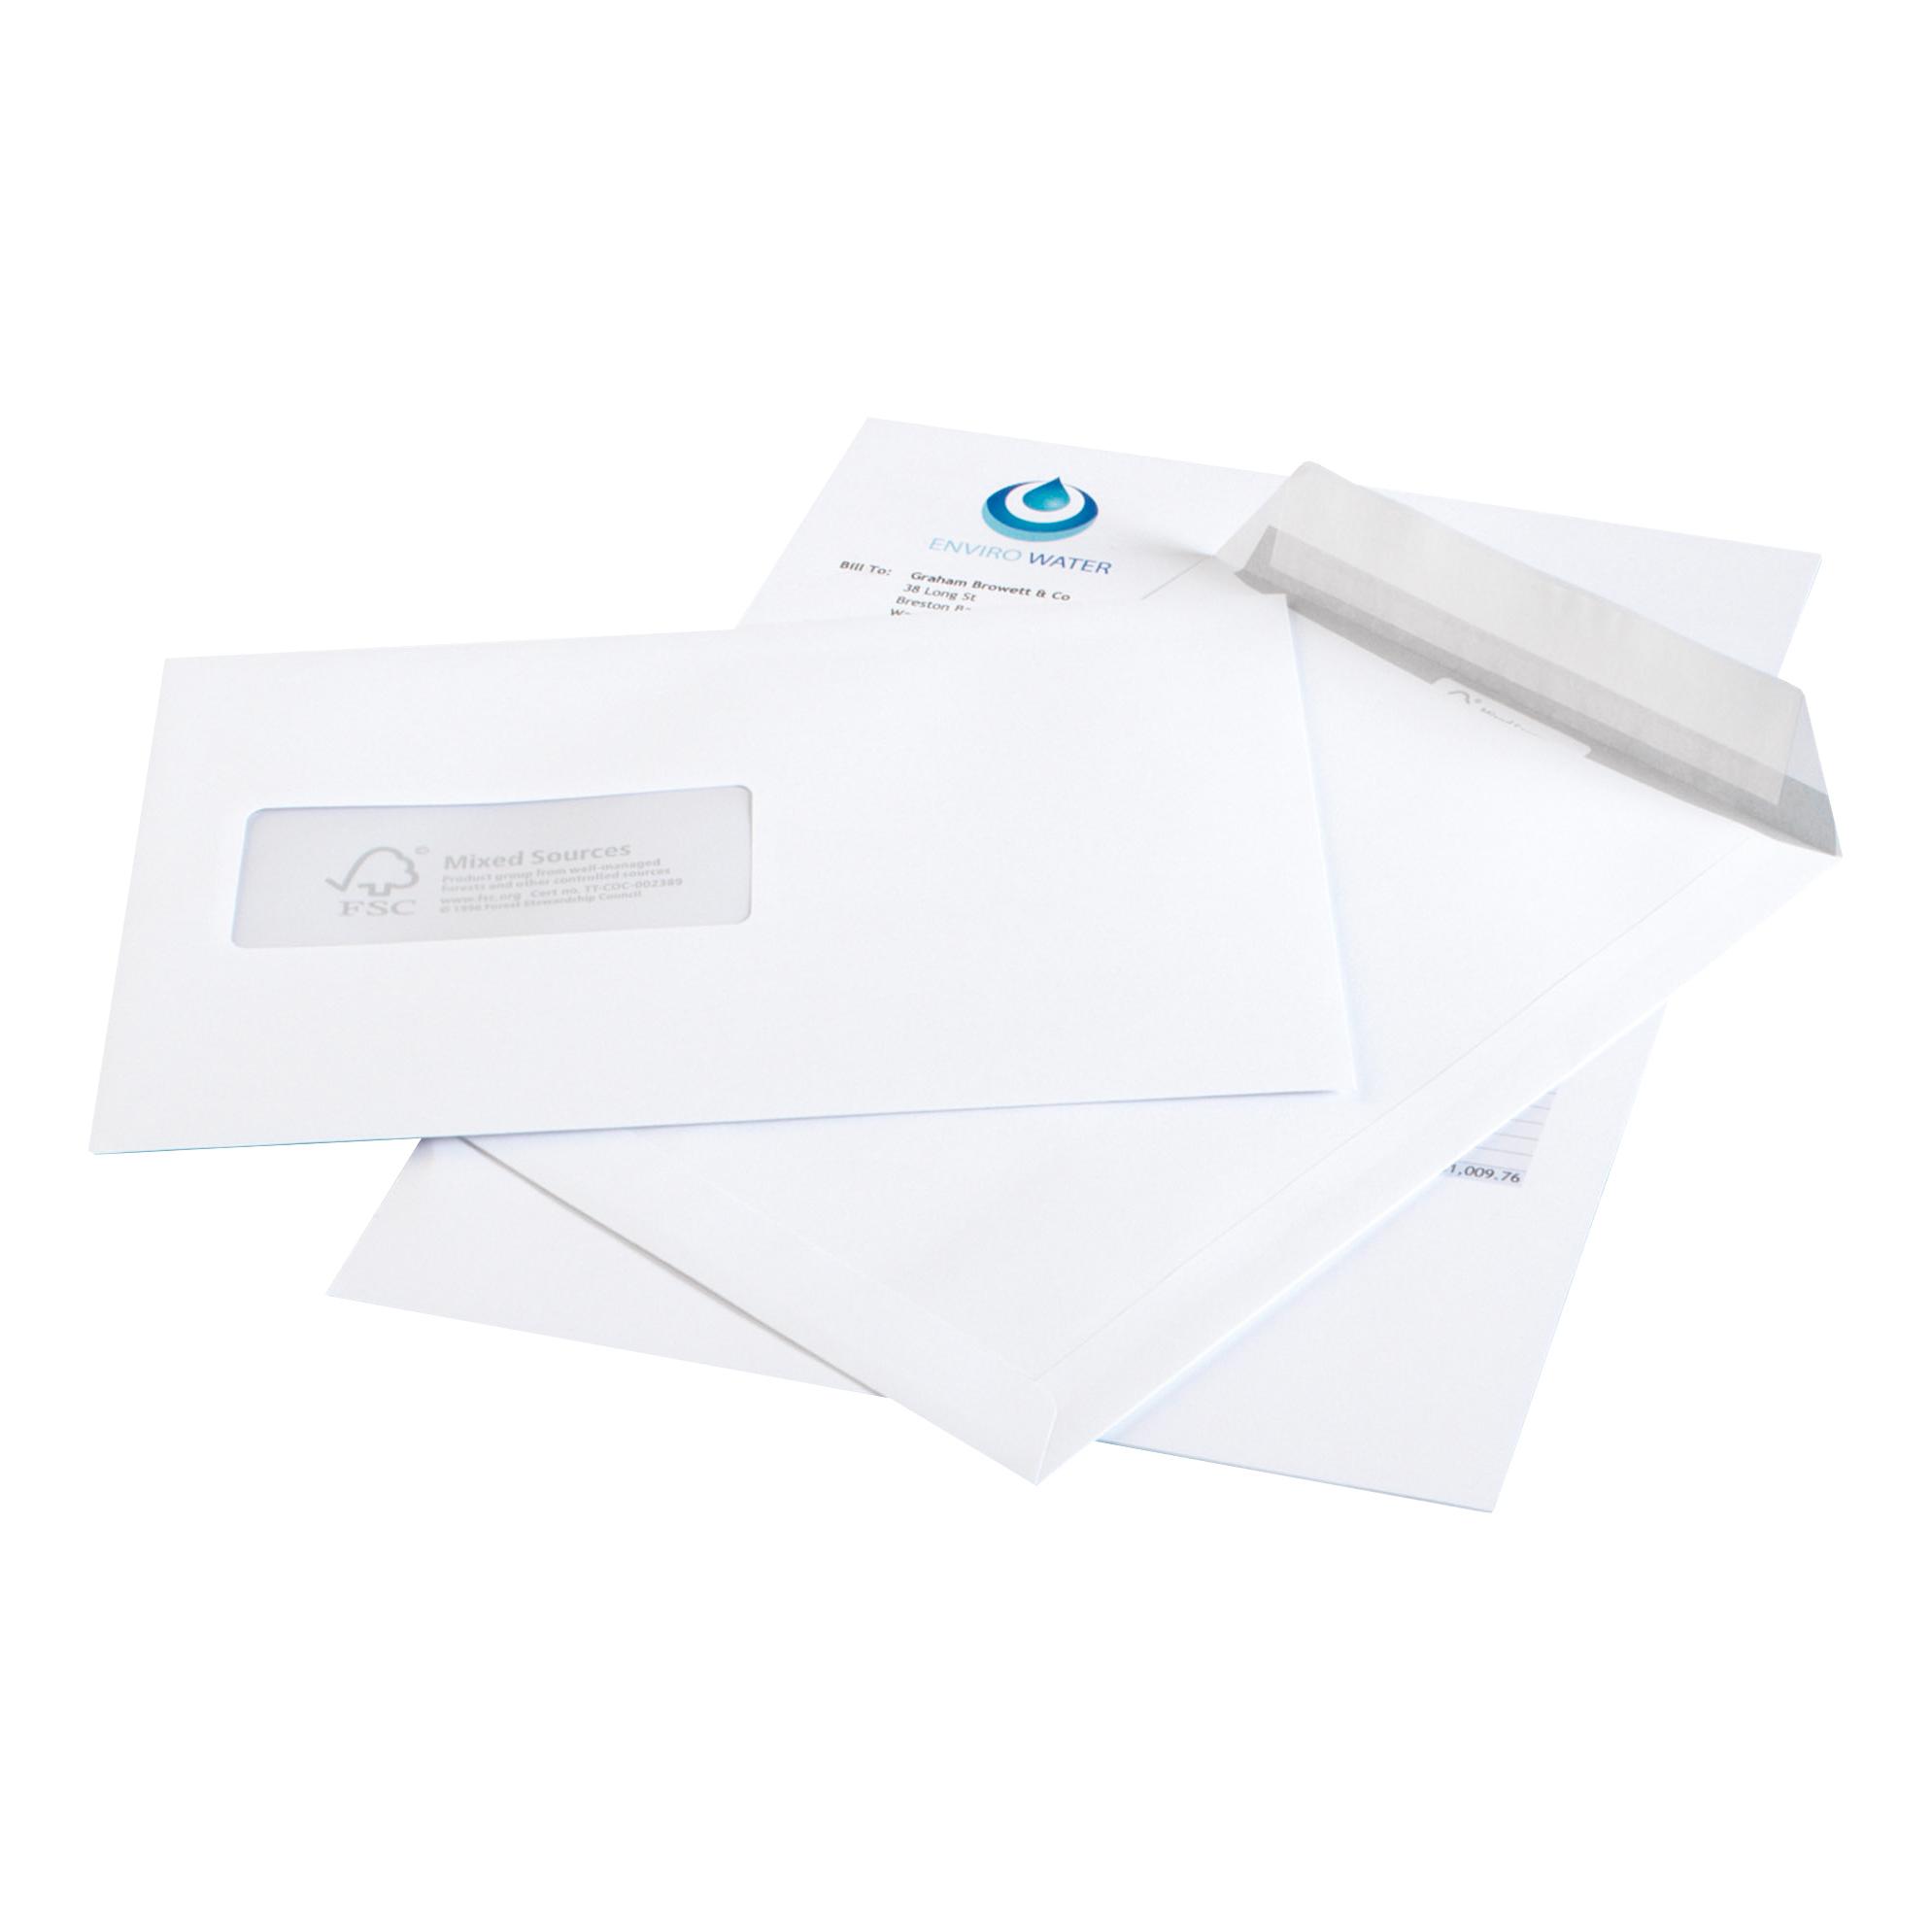 Purely Environmental Mailer Gummd Wndw White 90gsm DL+ 114x229 Ref FSC374 Pk1000 10 Day Leadtime